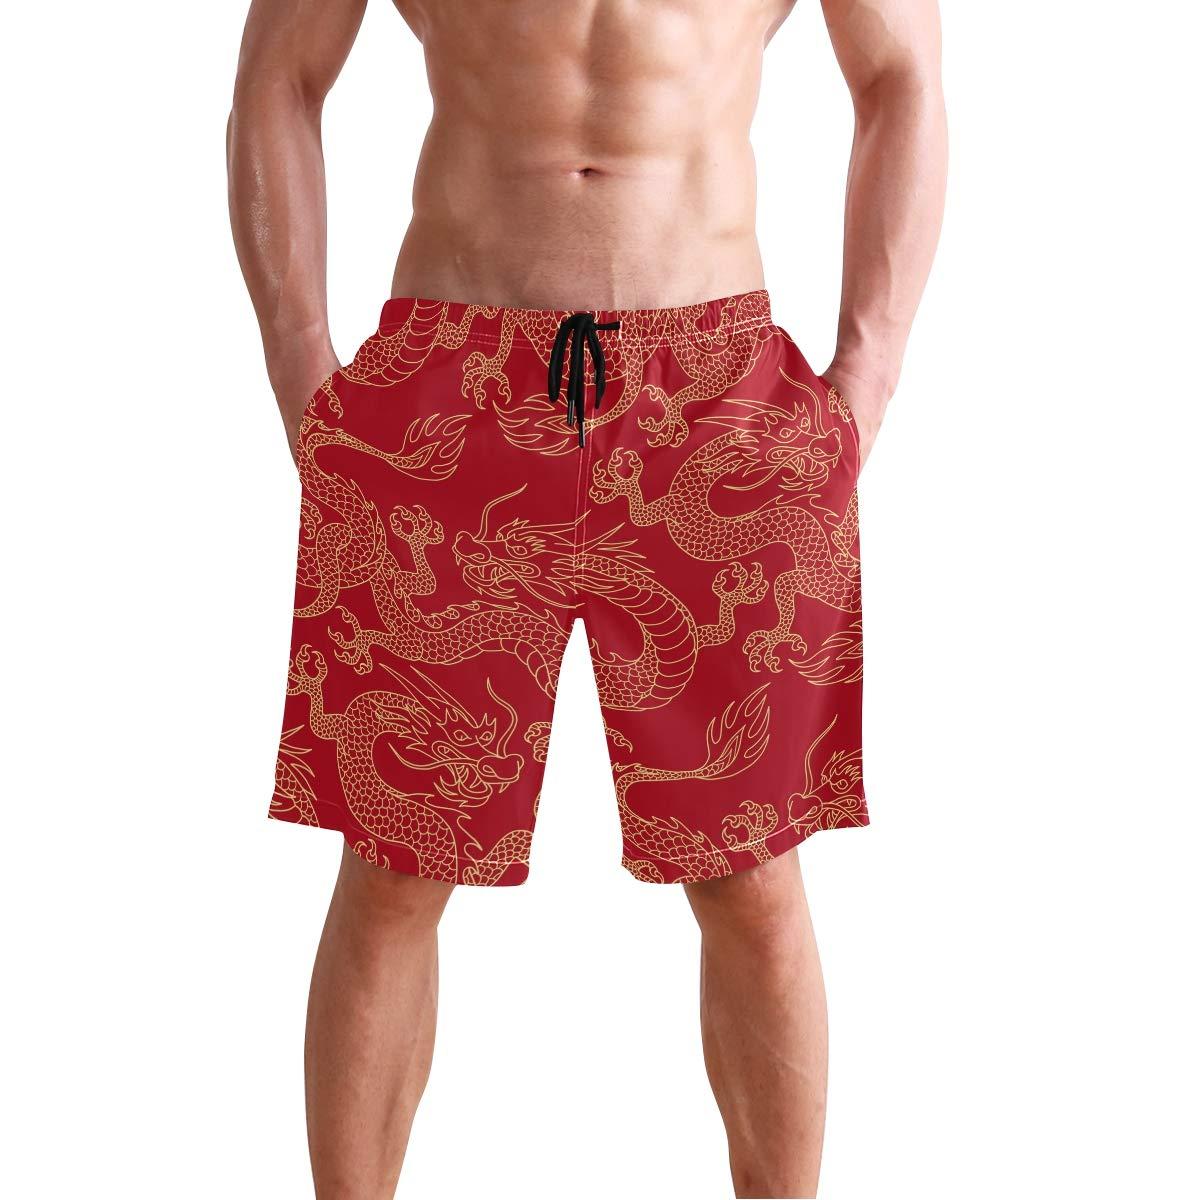 Mens Swim Trunks China Myth Golden Dragon Red Drawstring Boardshorts